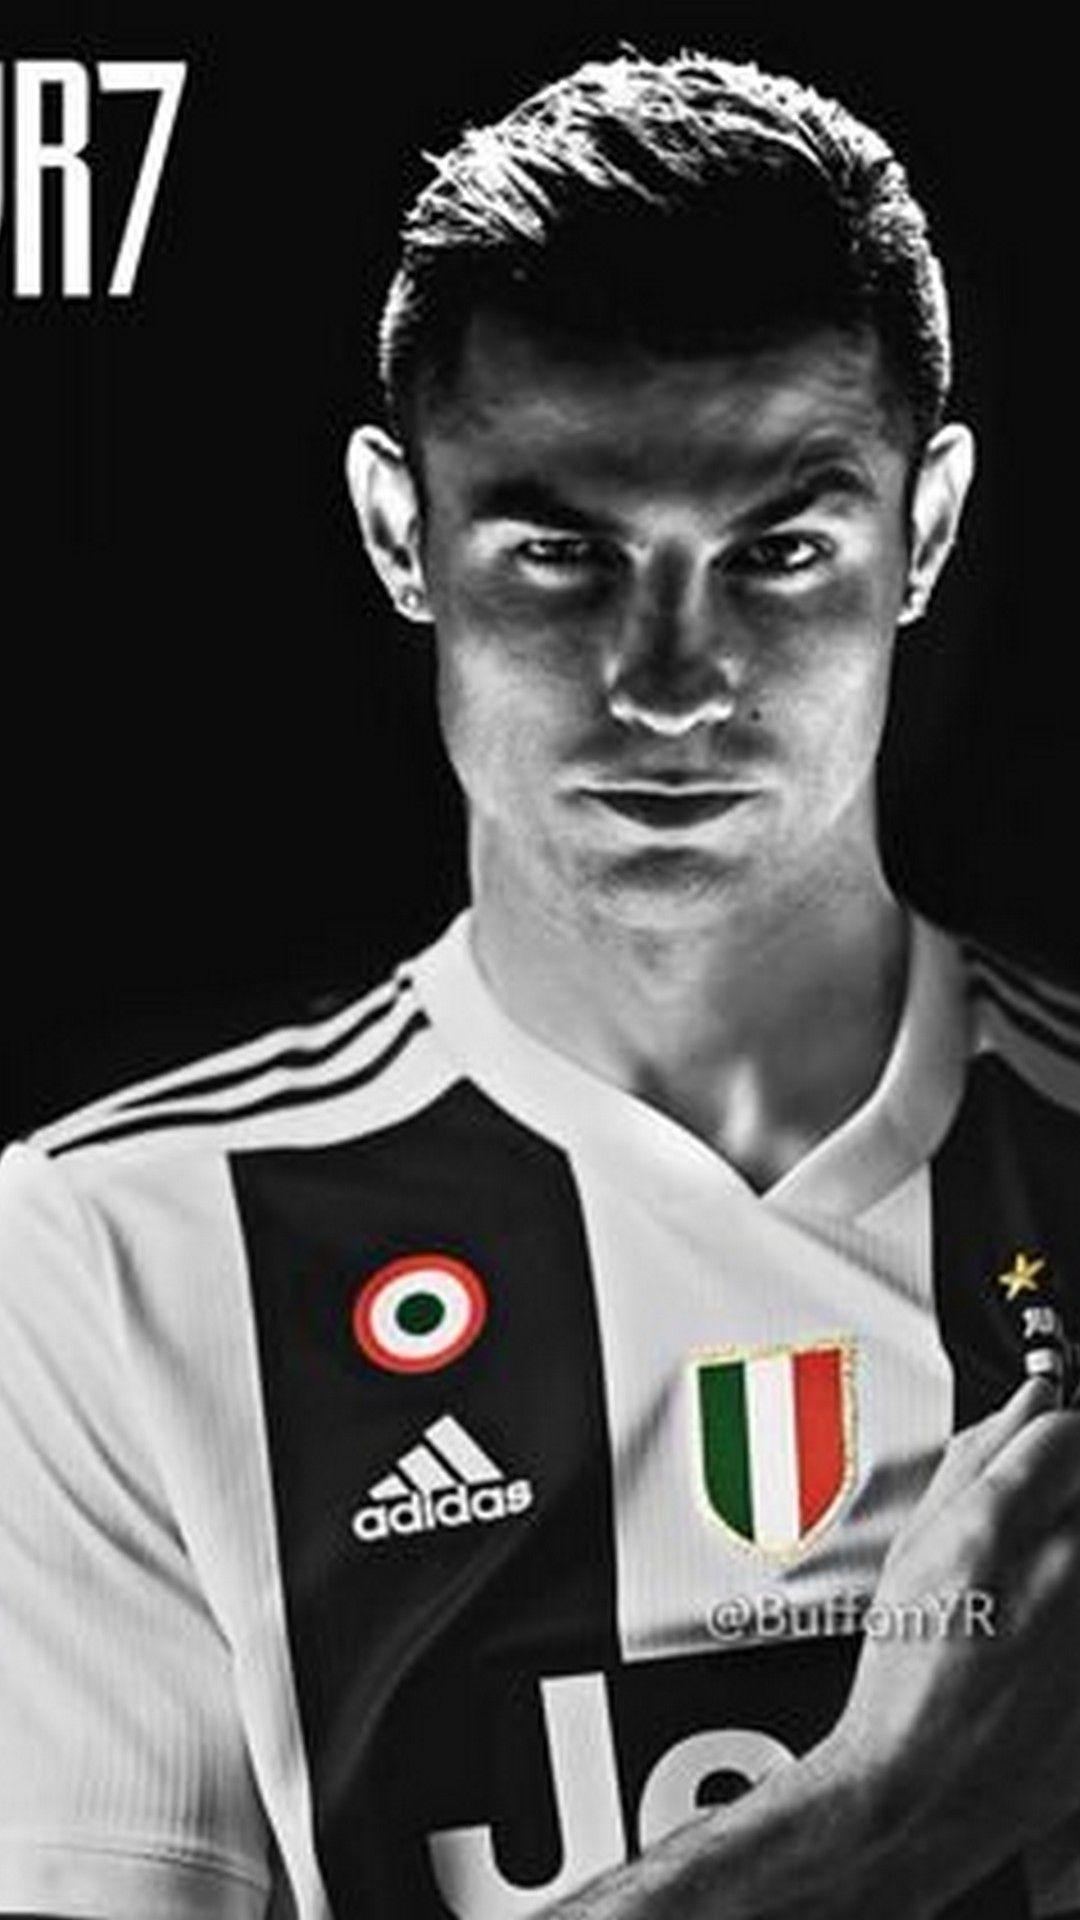 Cristiano Ronaldo Juventus Wallpaper Android 2019